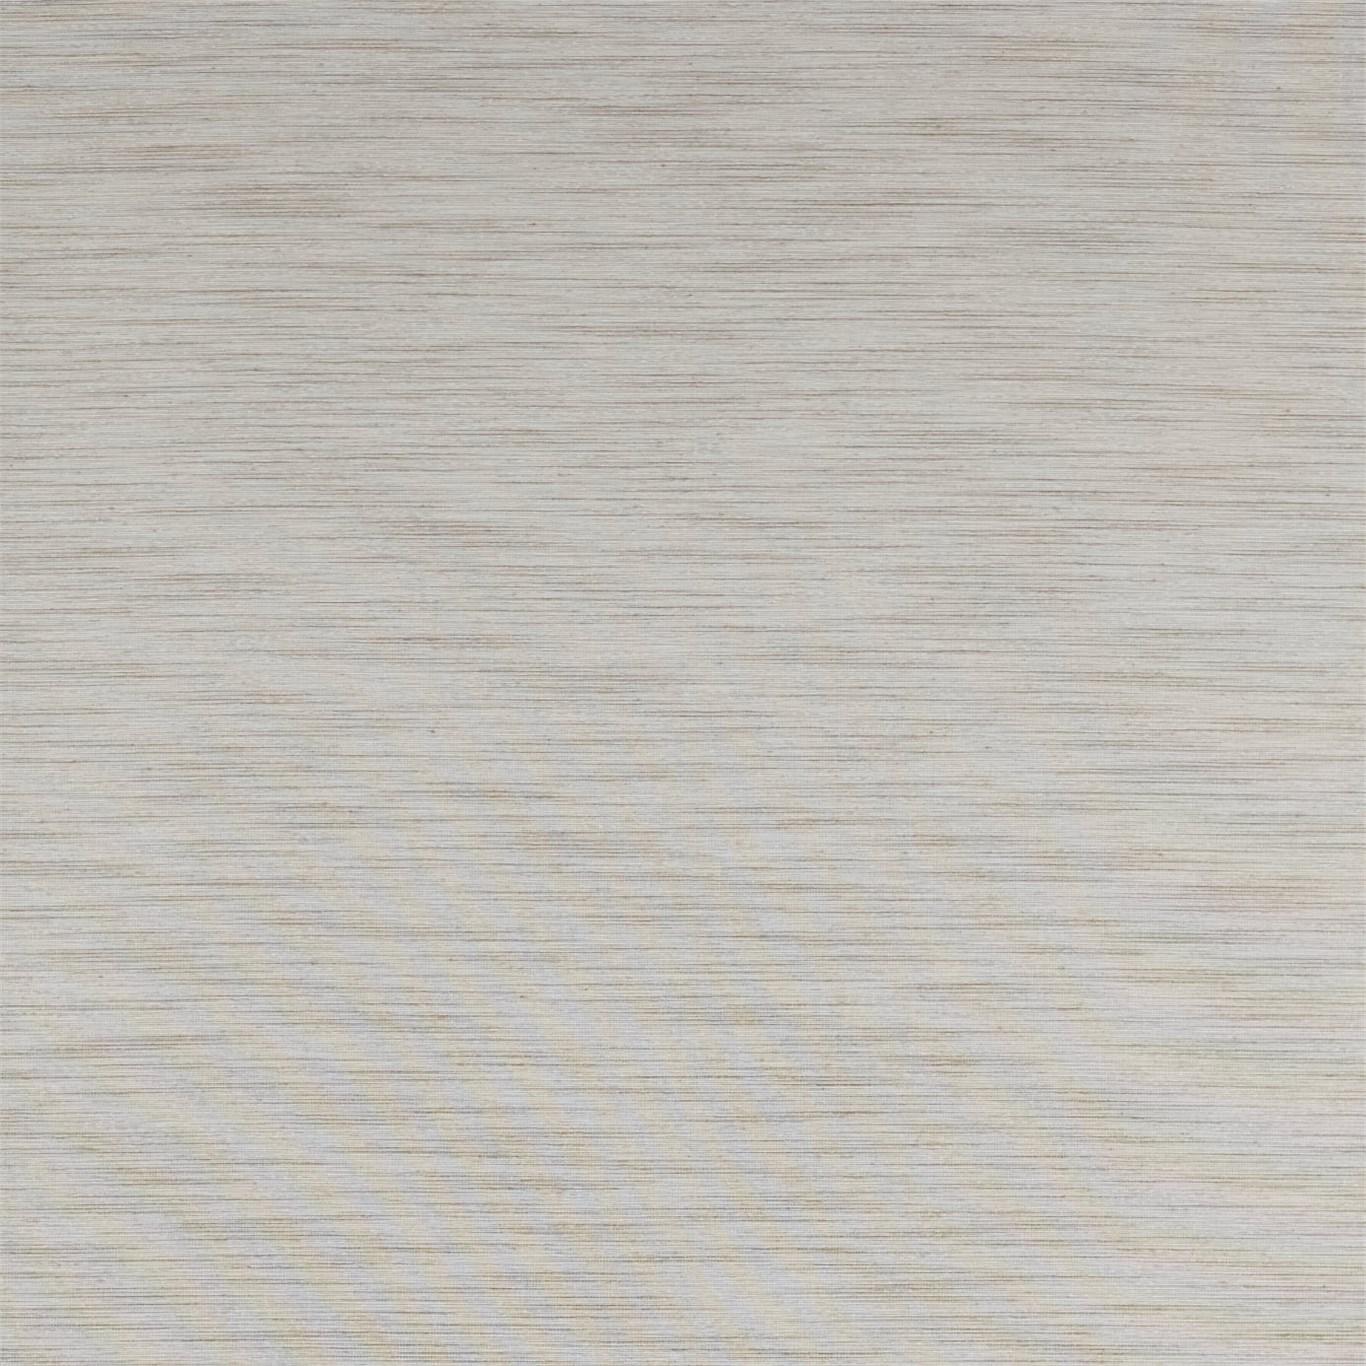 Английские обои Zoffany,  коллекция Akaishi, артикул312492